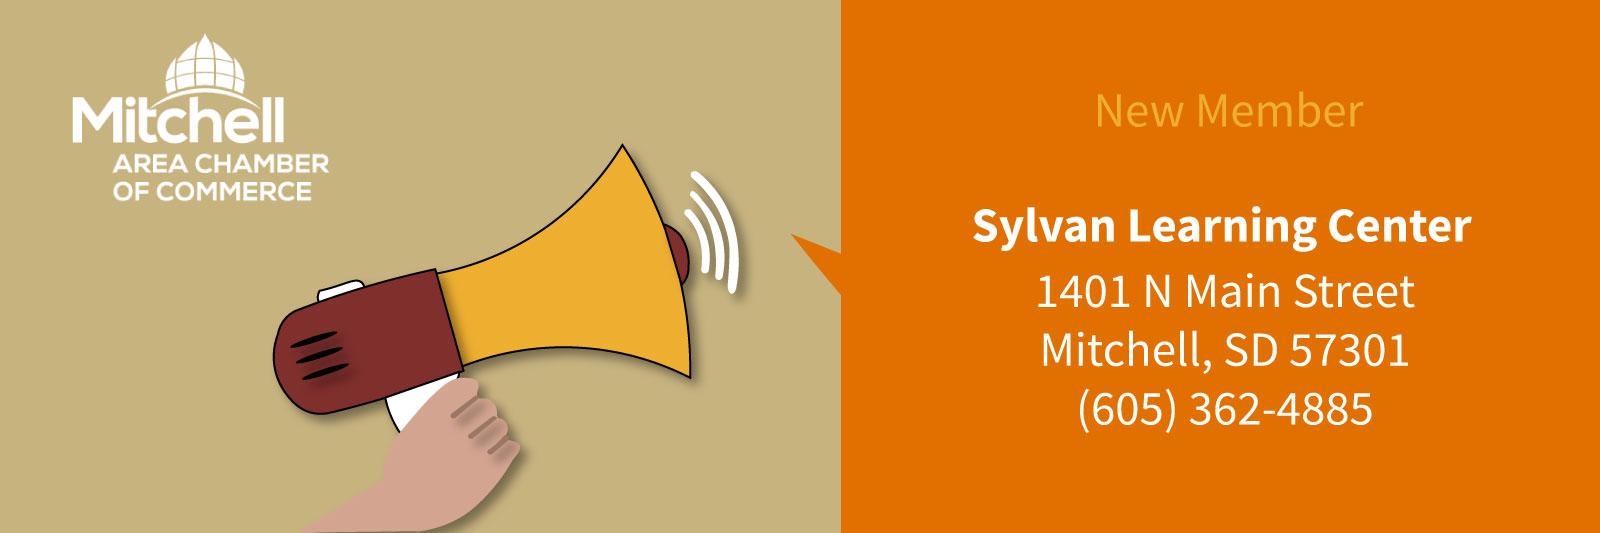 sylvan_learning_center.jpg